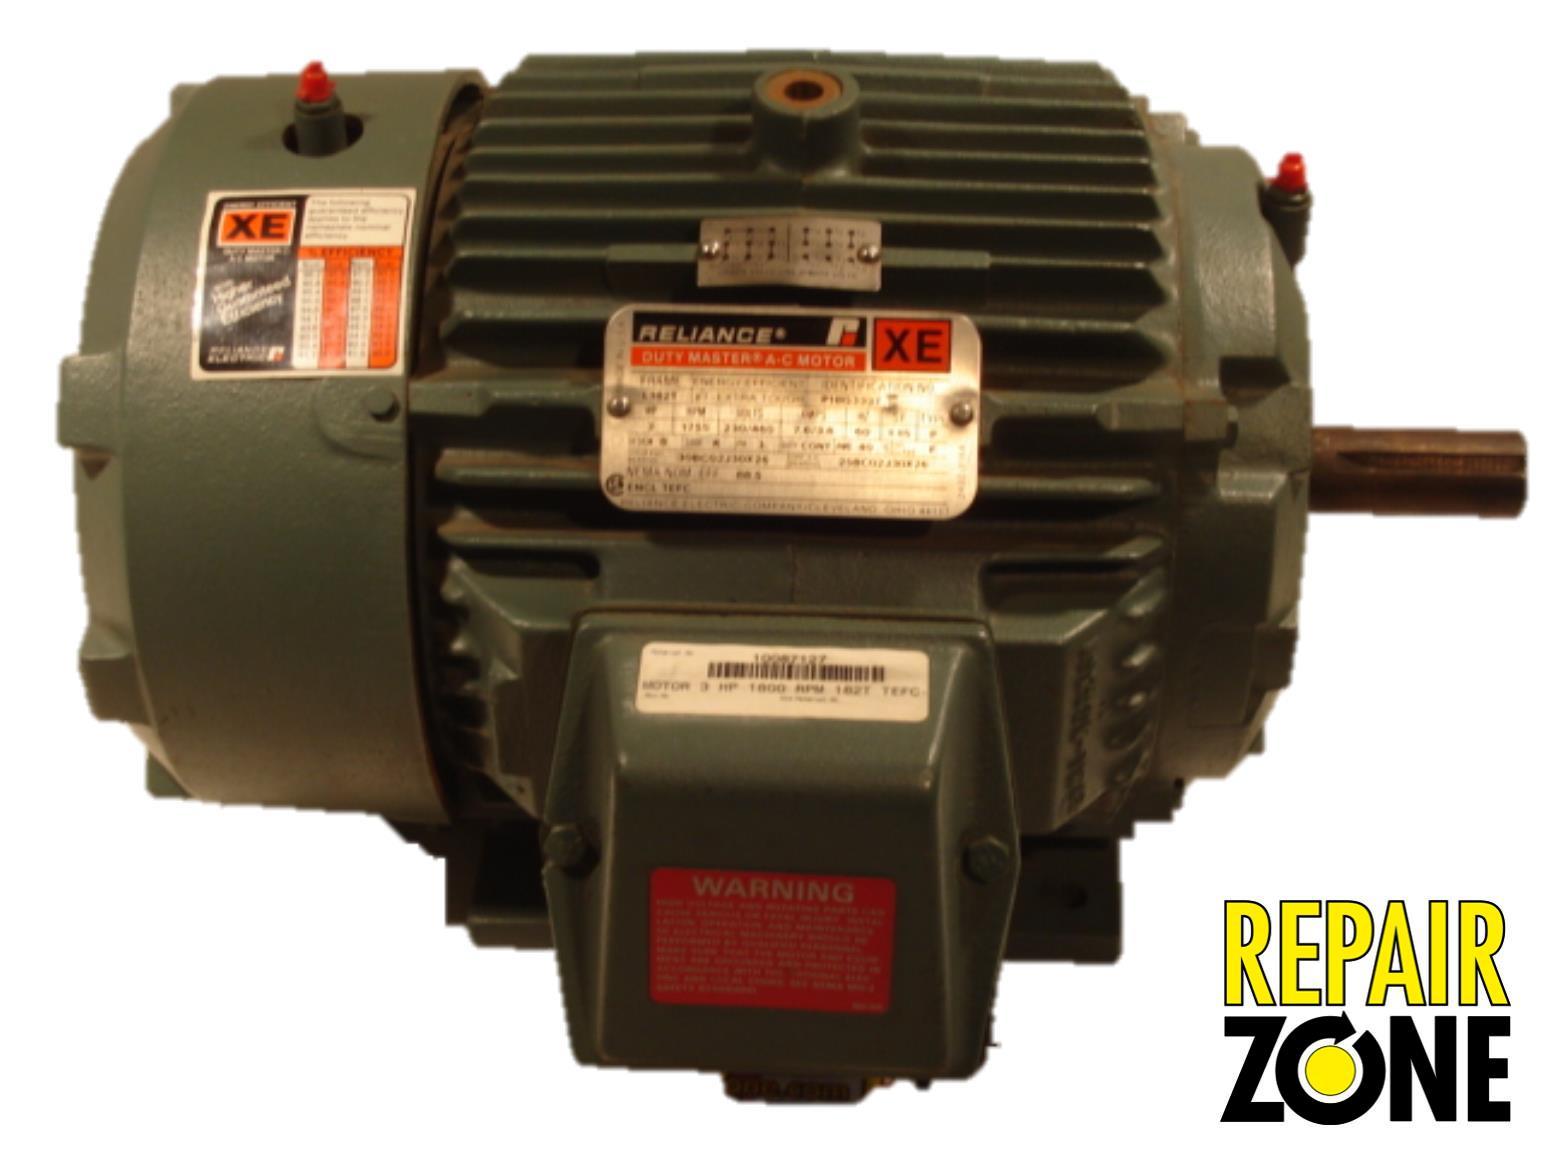 P18g3337 reliance three phase motors new ebay for 3 phase motor troubleshooting